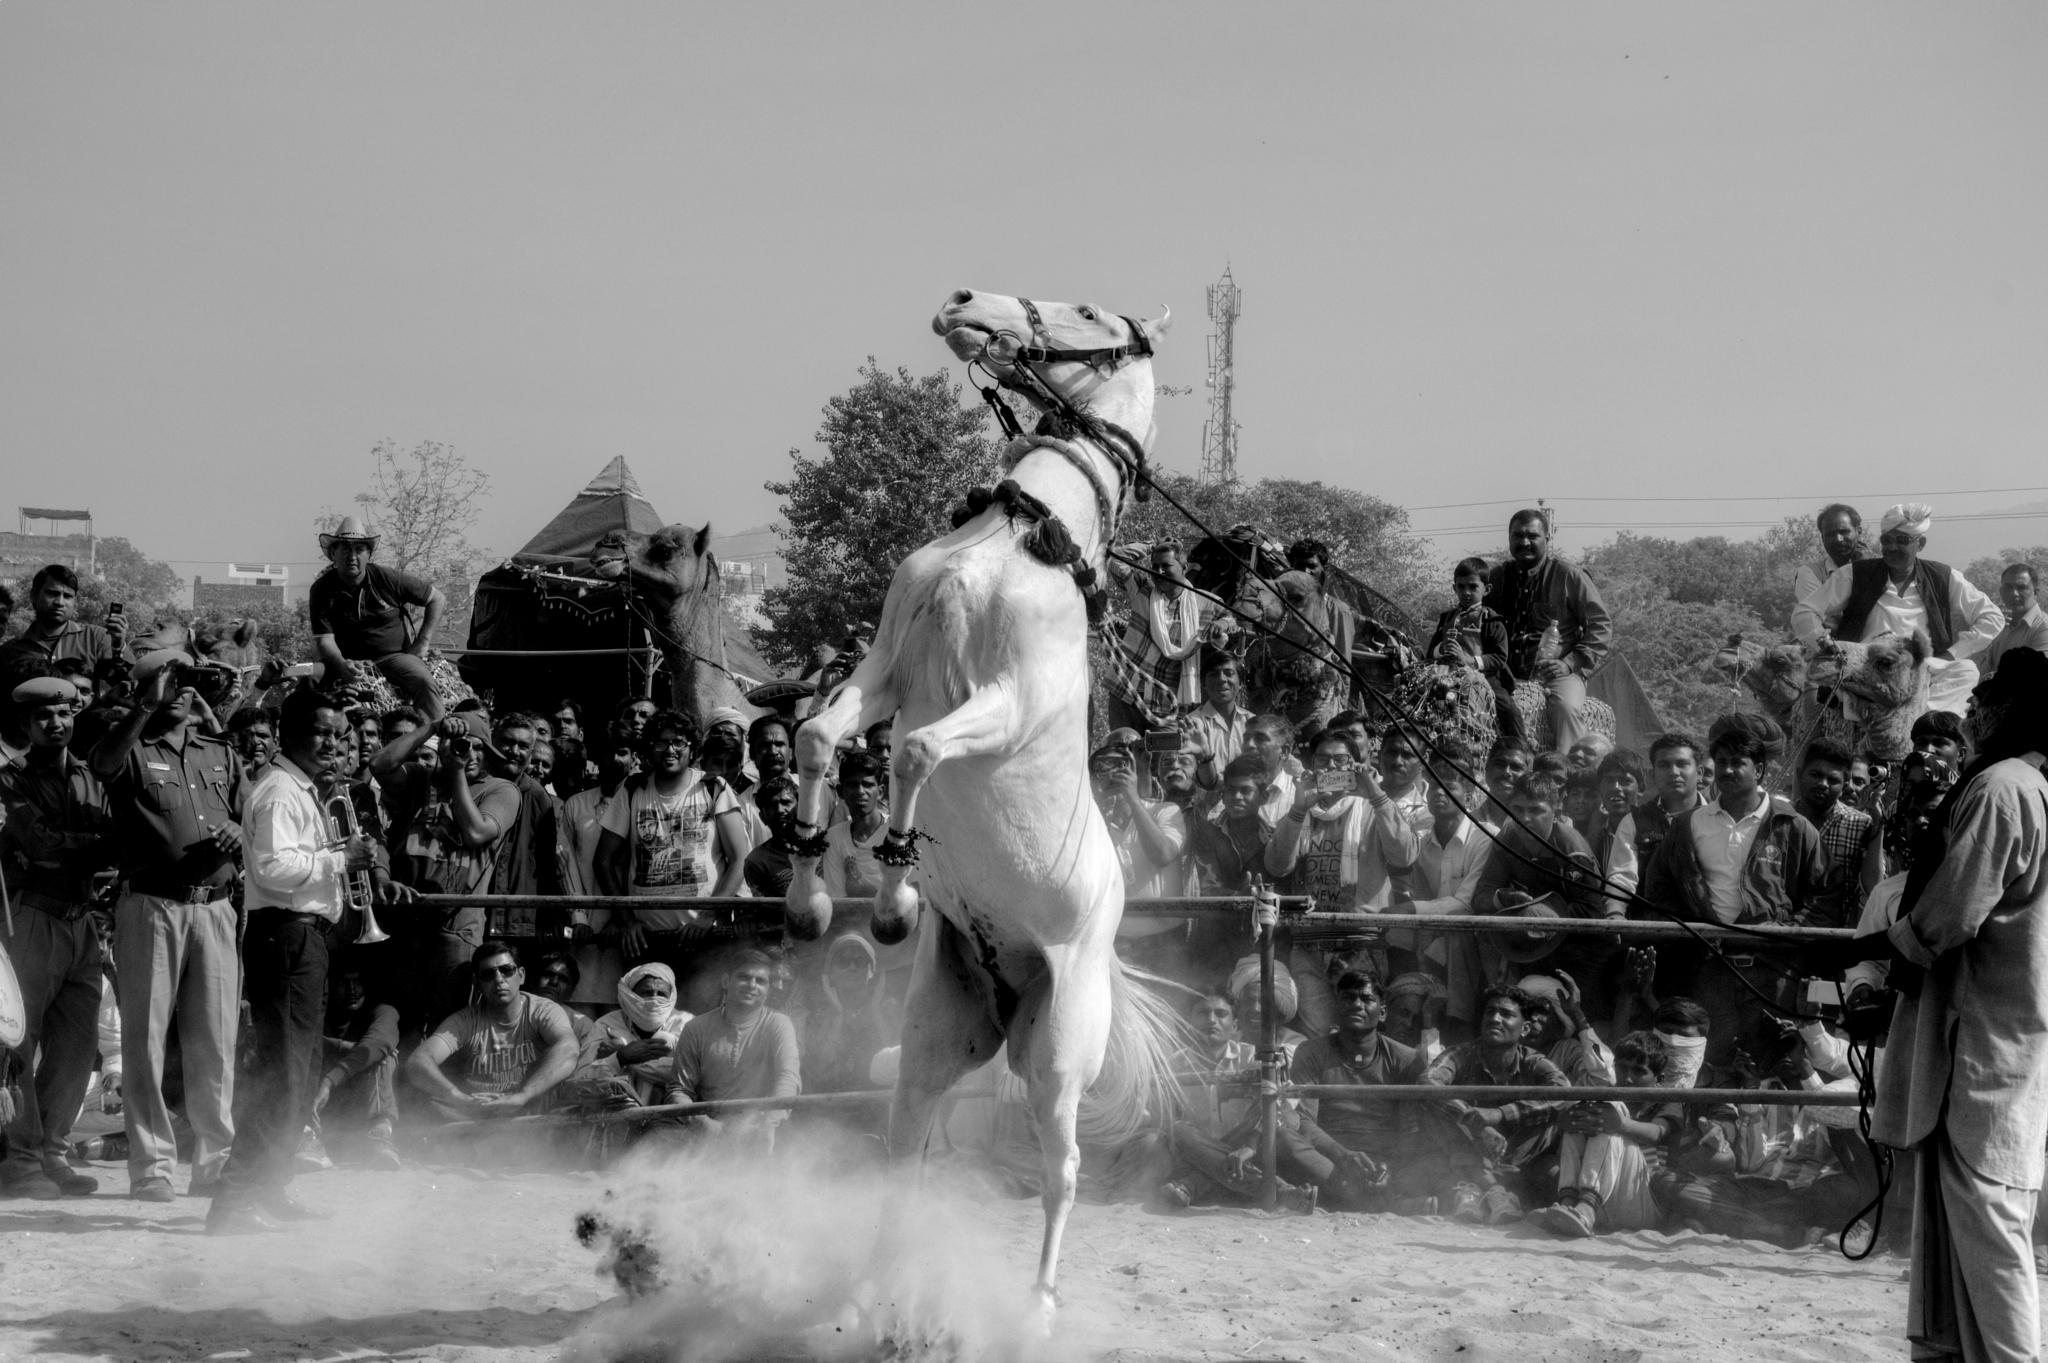 Dancing Horse by sanjeev.k.goyal.10